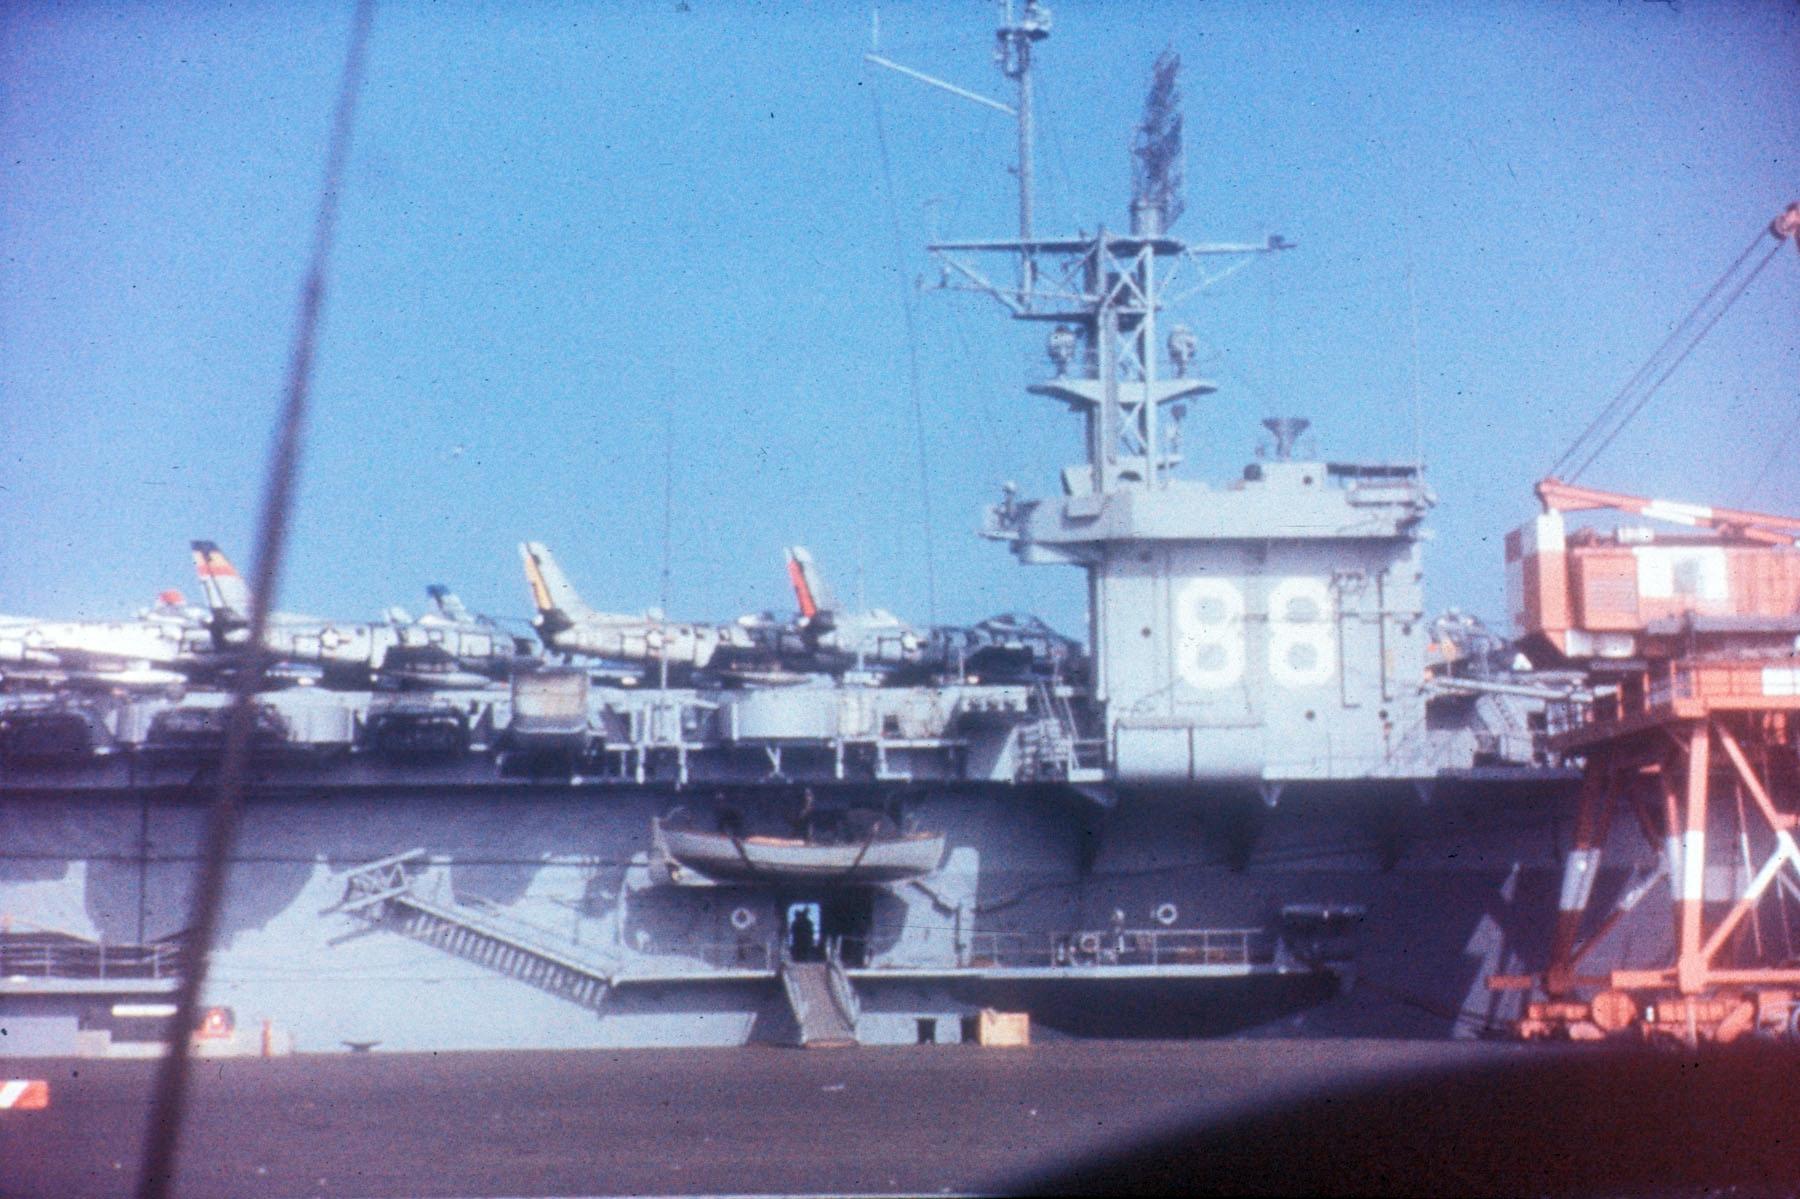 First_F-86s_arrive_in_Korea_on_USS_Cape_